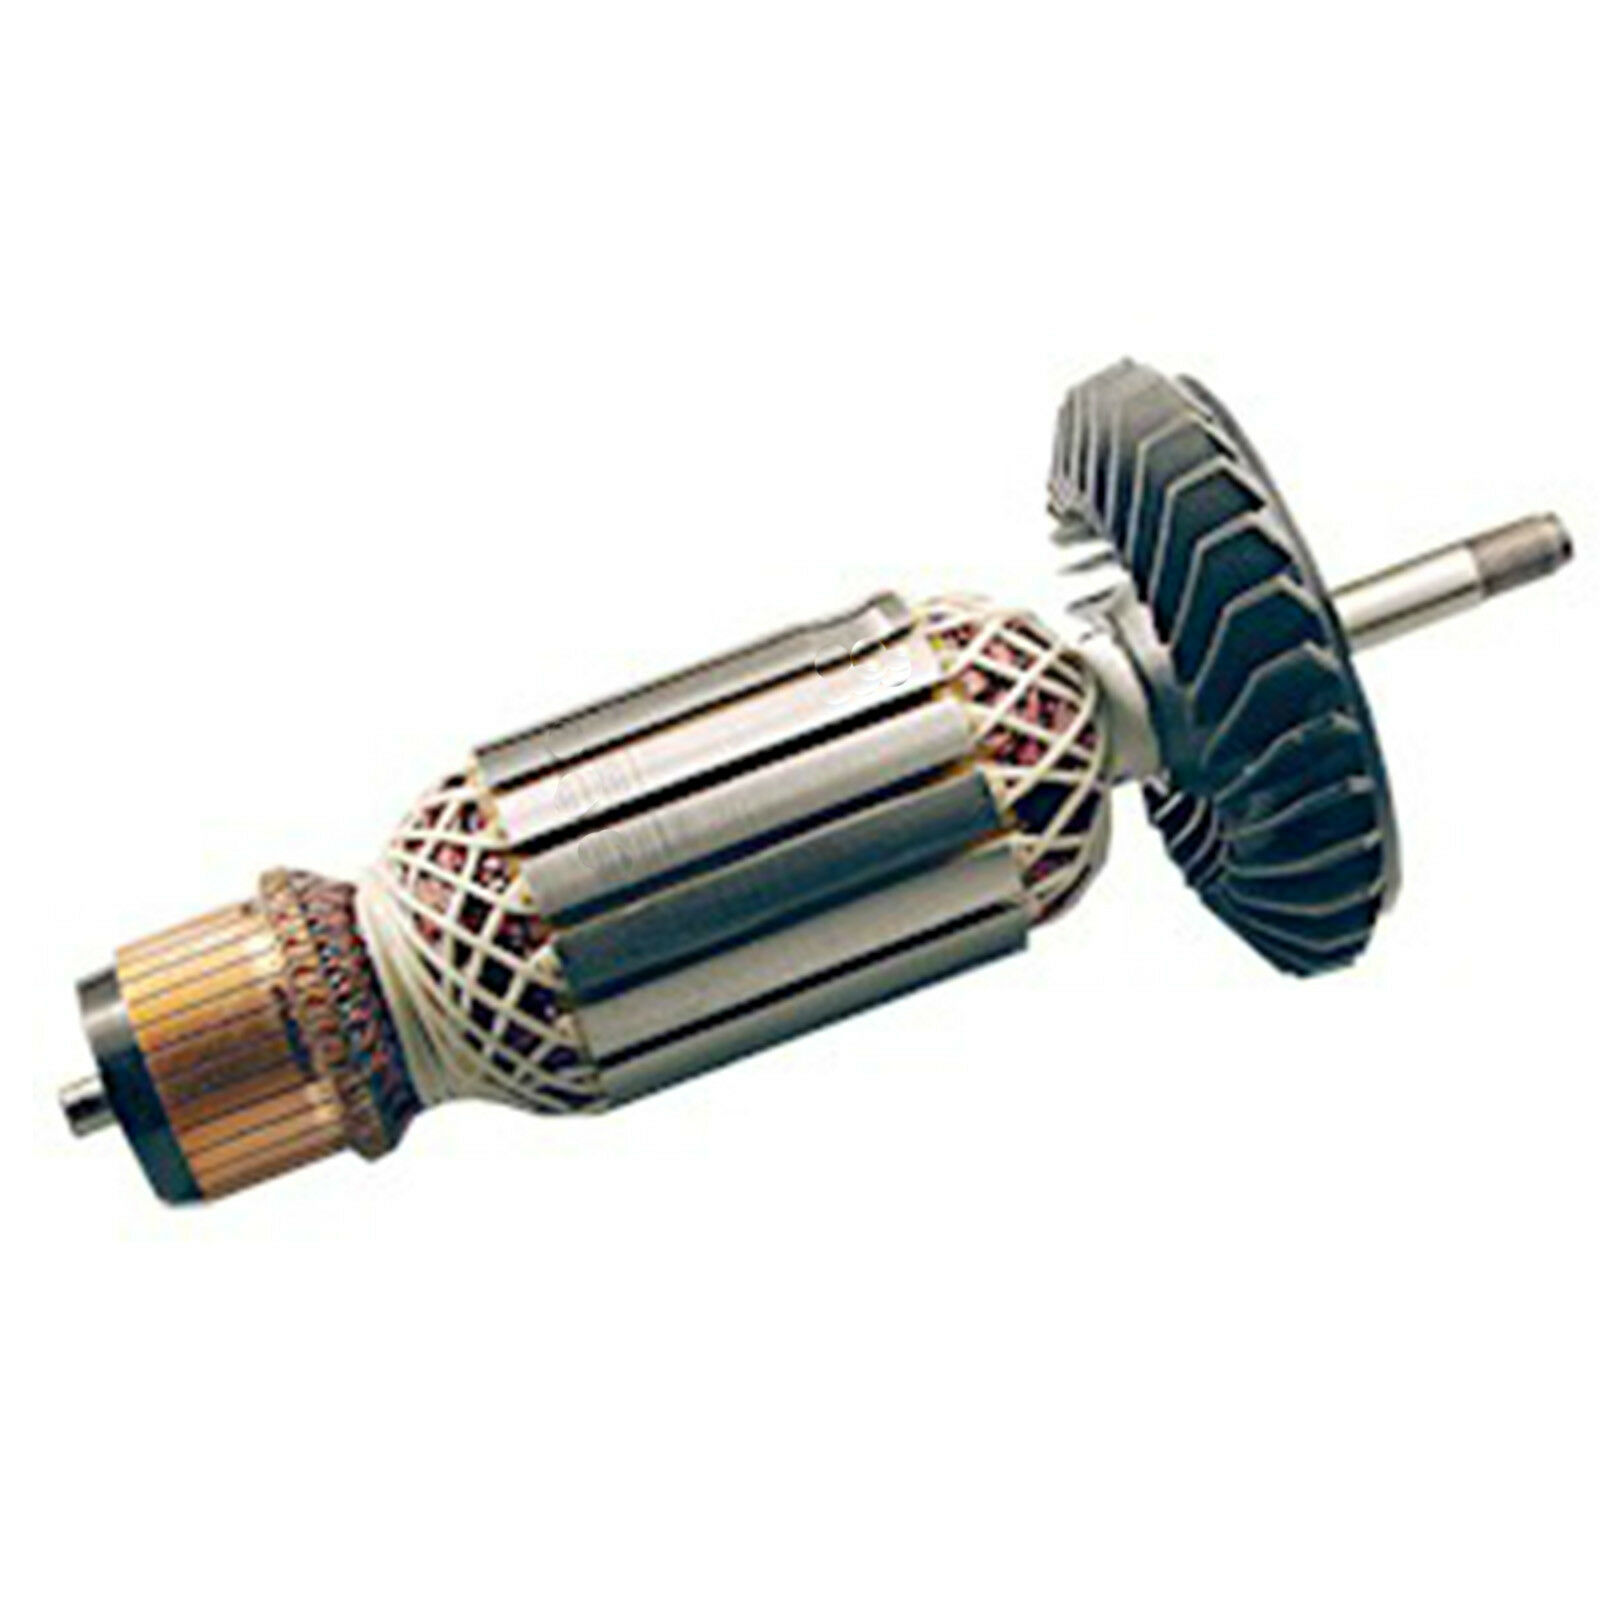 New Bosch Genuine Parts Armature 1604011156 for GWS24-230,GWS24-300 Grinder 220V